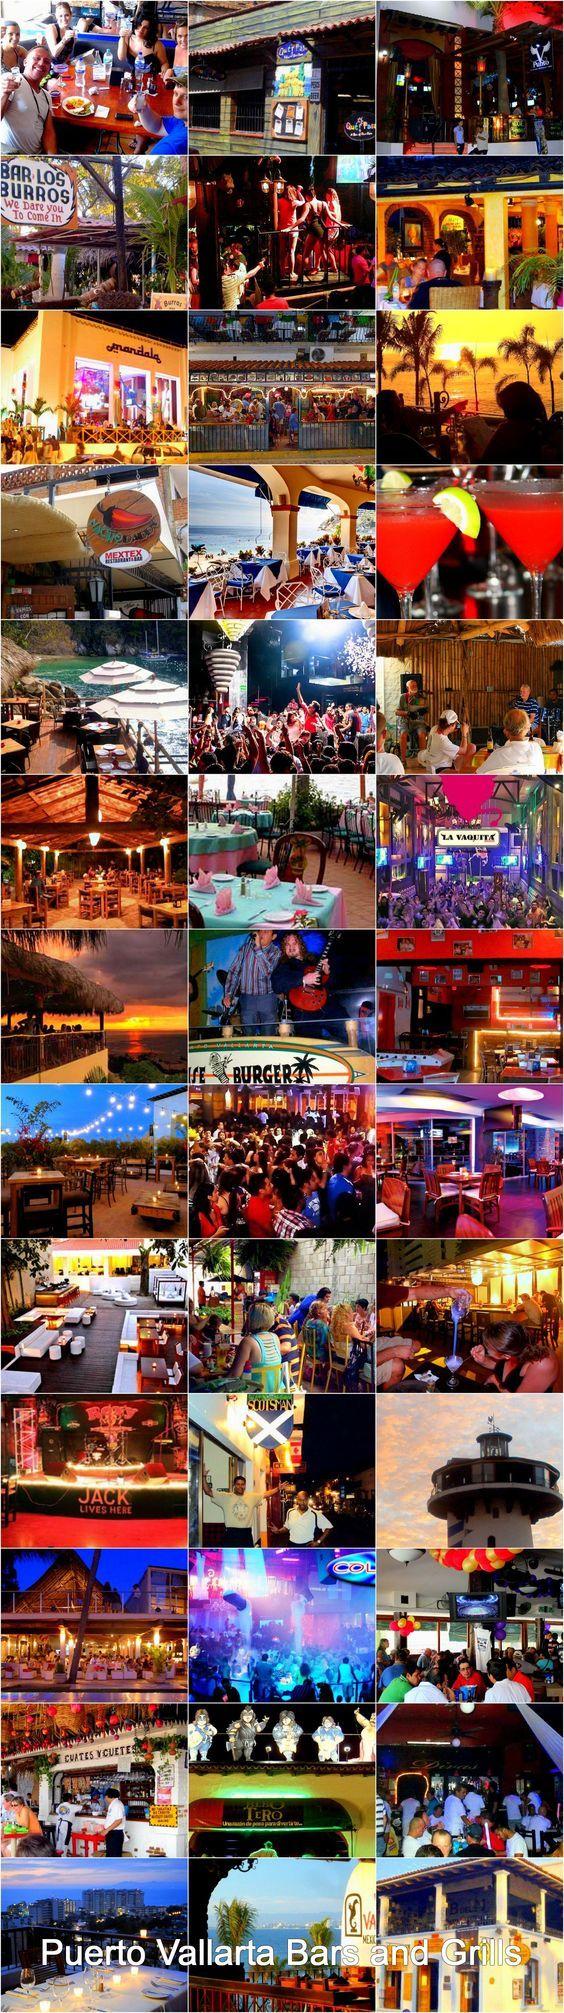 List of bars & grills in Puerto Vallarta: http://www.puertovallarta.net/what_to_do/puerto-vallarta-bars-and-grills.php Lista de grills y bares en Puerto Vallarta: http://www.puertovallarta.net/espanol/que-hacer/bares-grills-en-puerto-vallarta.php #vallarta #puertovallarta #bares #bars #grills #jalisco #mexico